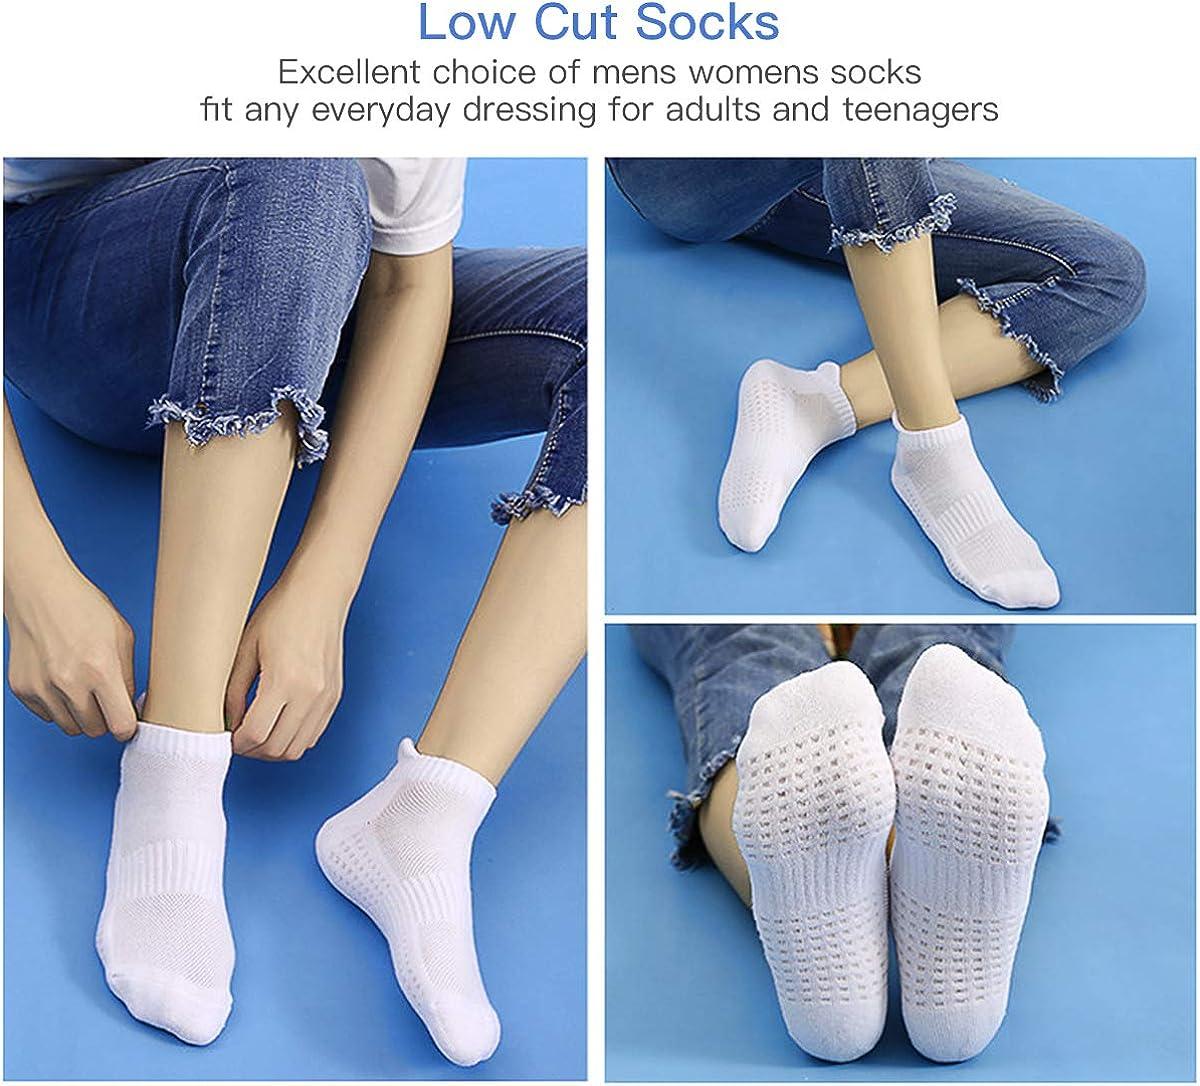 AUGOLA Running Socks Cushioned Sports Socks Cotton Ankle Socks Trainer Socks for Men Women Ladies Low Cut Athletic Socks